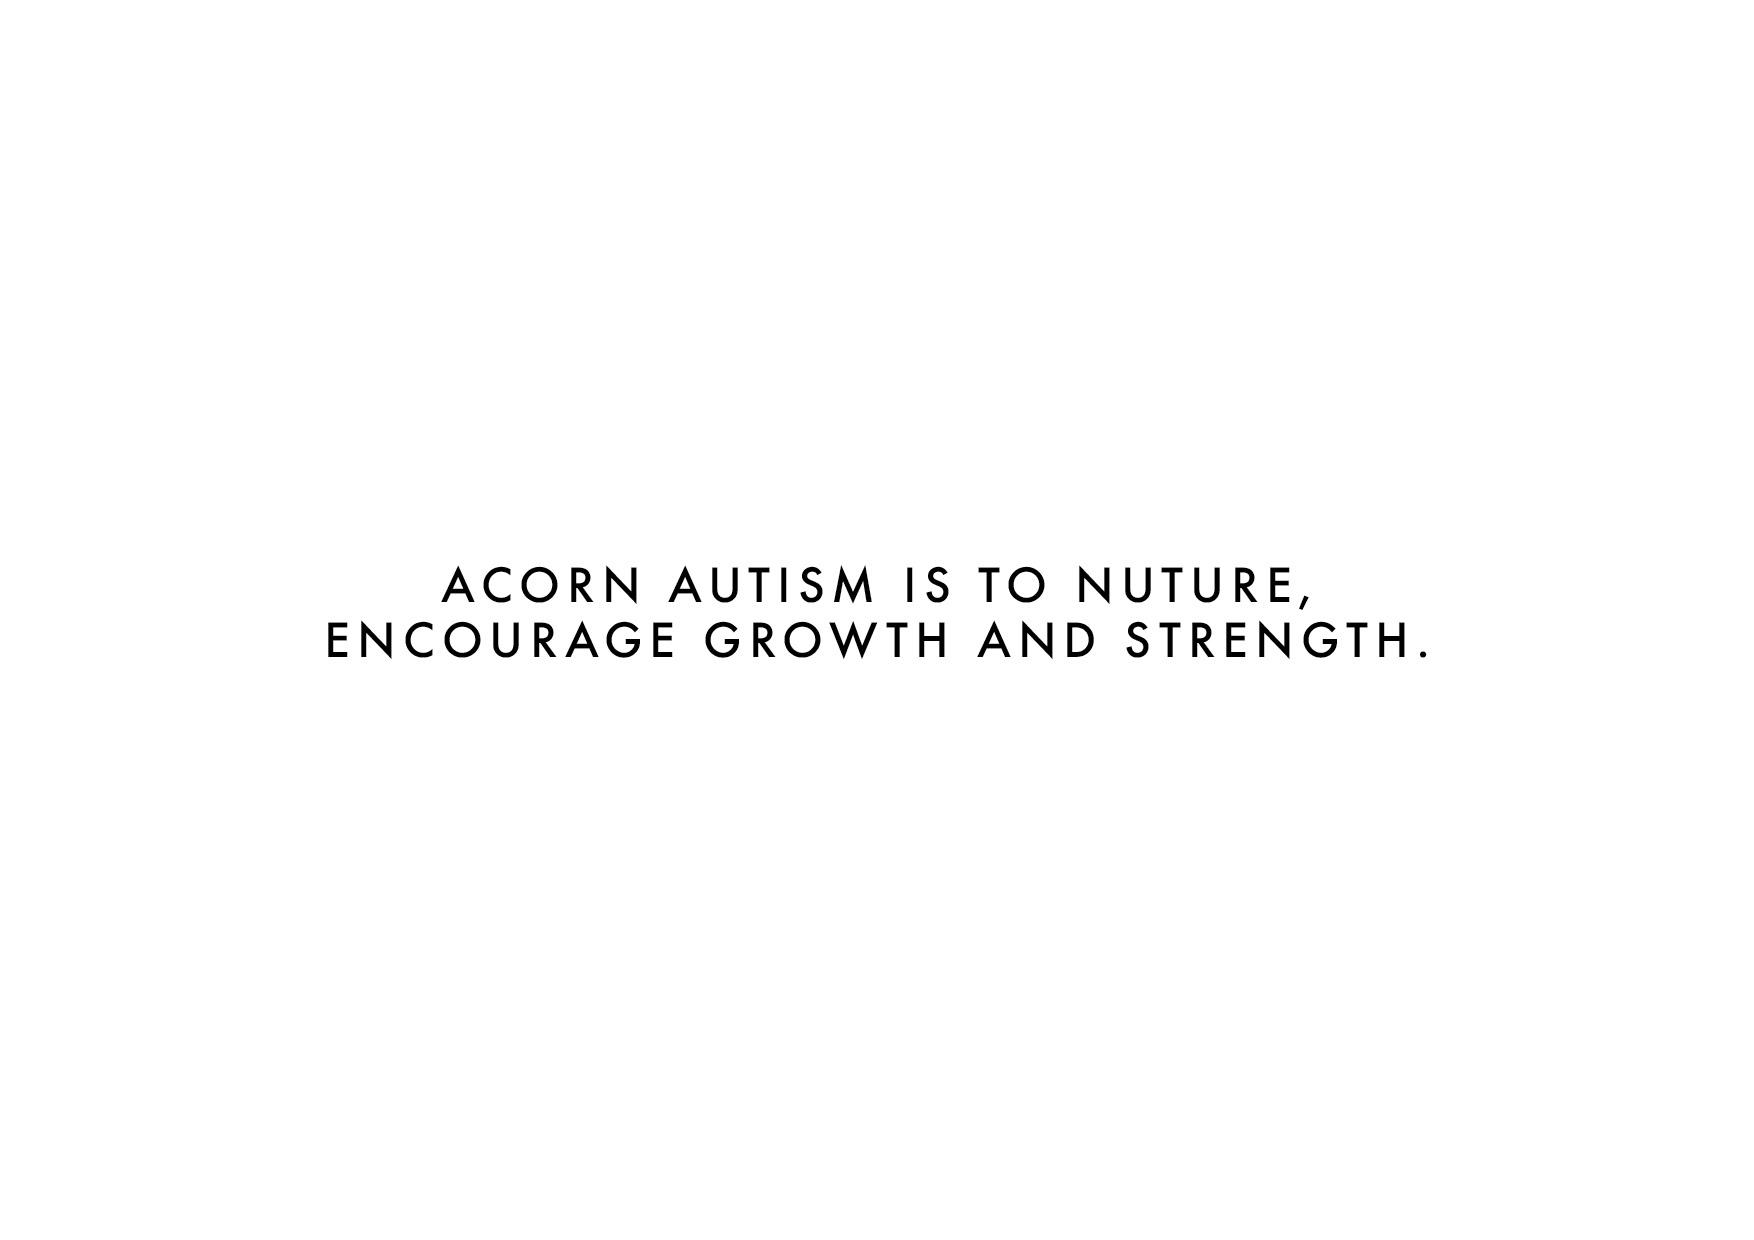 Rochelle-Vranjes-Acorn-Autism-Branding-Guidelines2.jpg